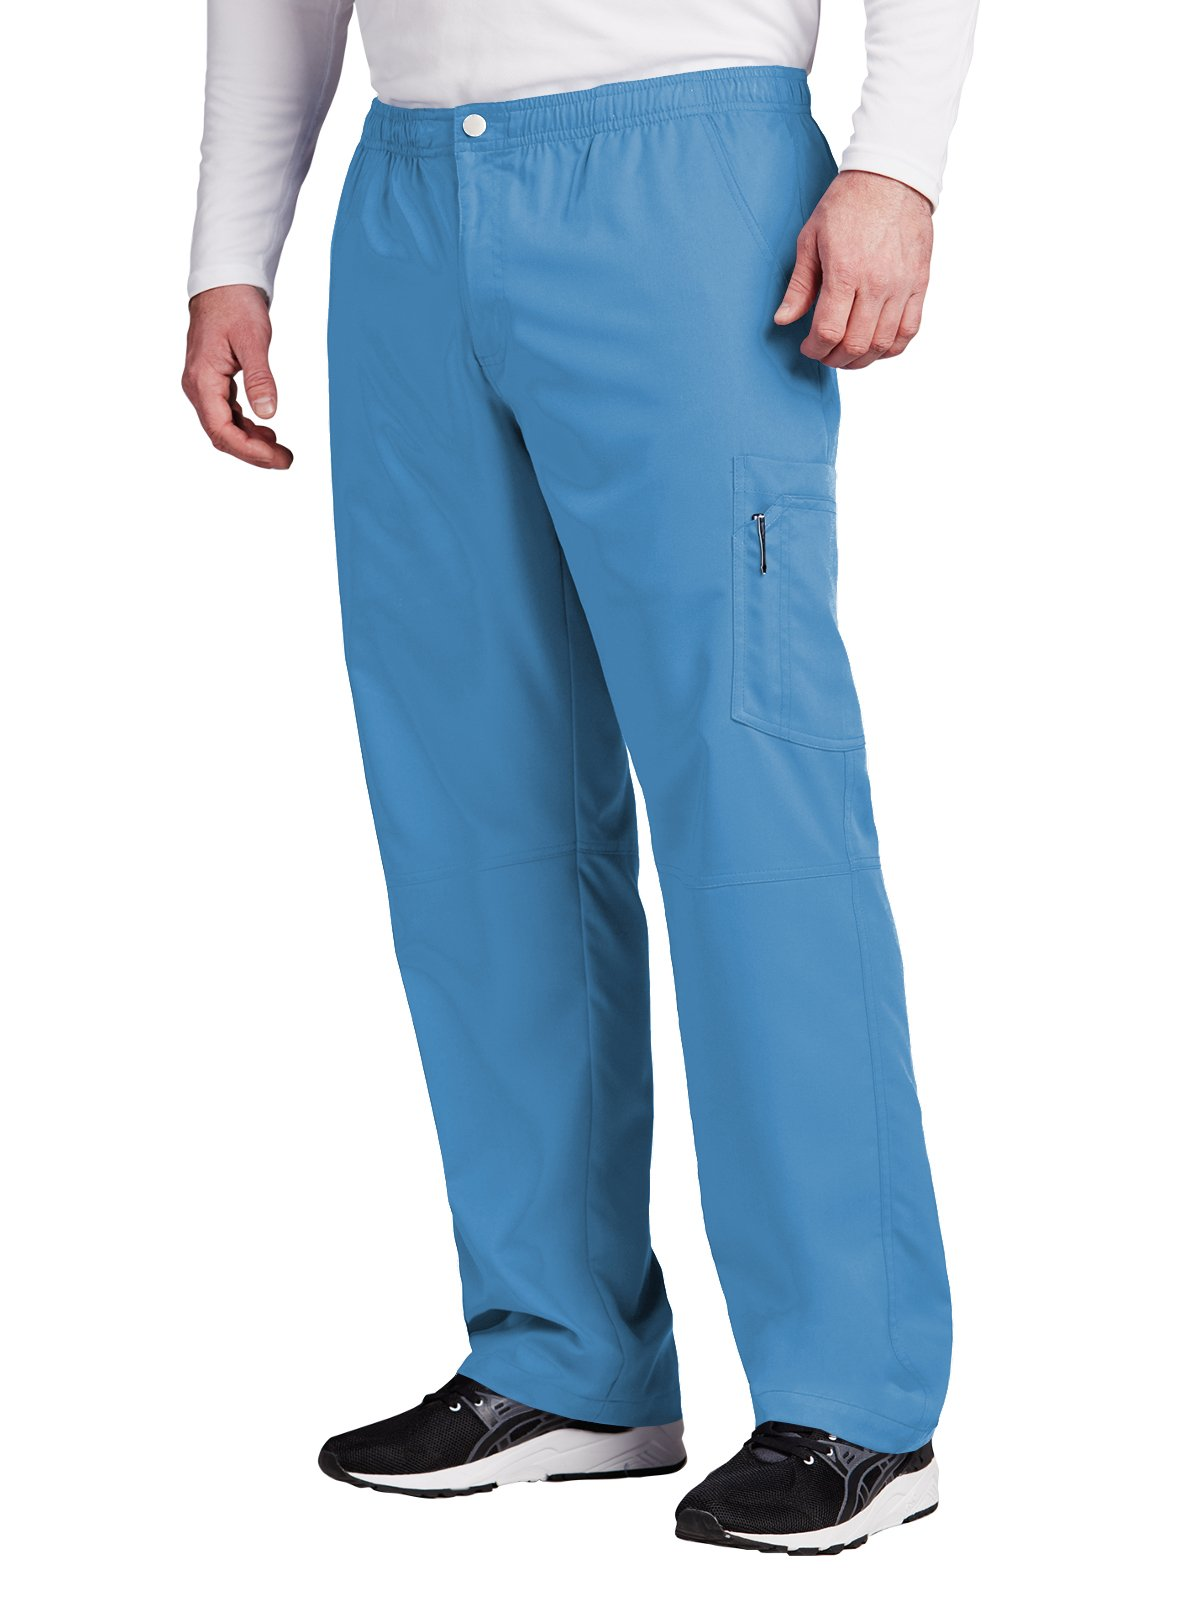 Grey's Anatomy Active 0215 Men's Cargo Pant Ciel Blue S